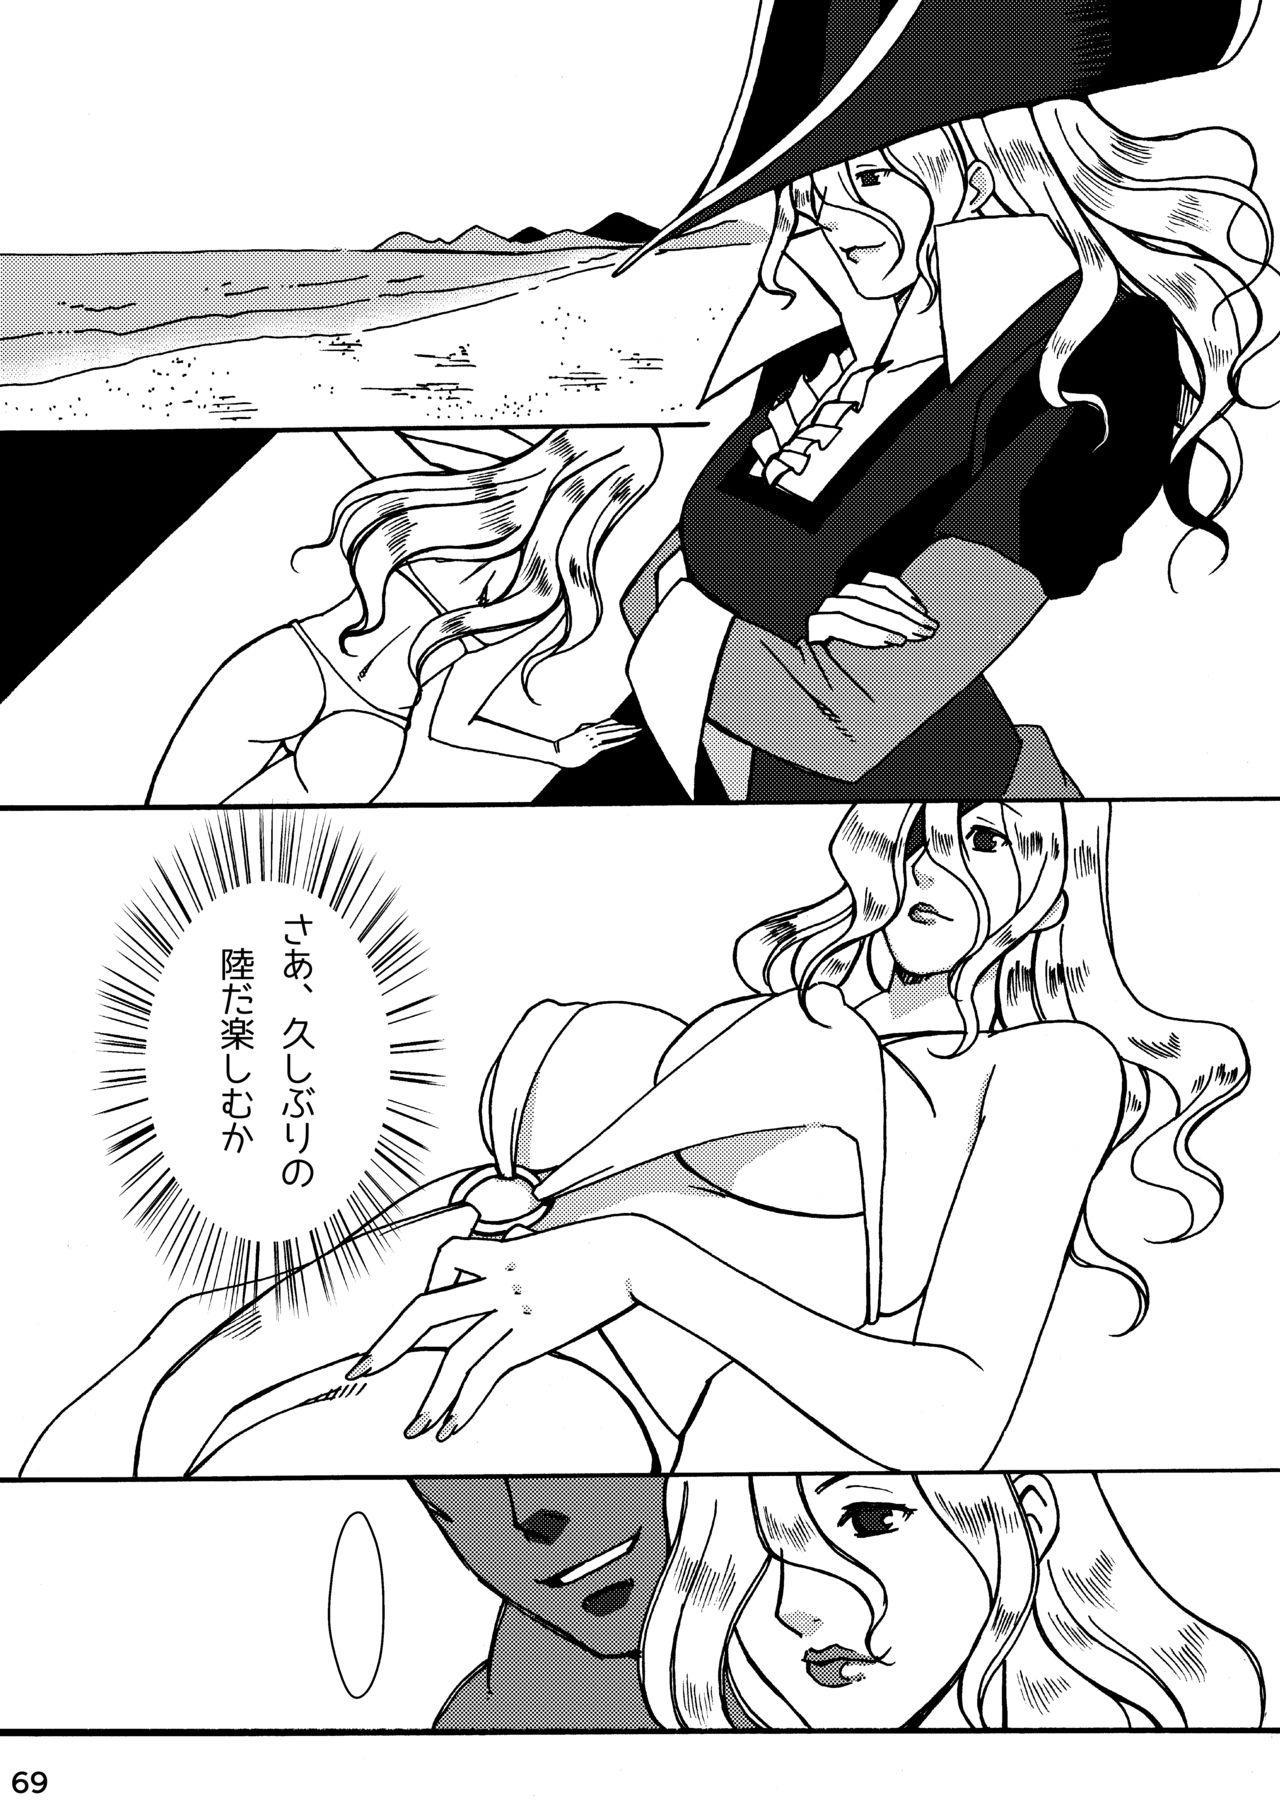 CA〇COM(&MORE!) VS FIGHTING GIRLS Swimsuit&Gangbang Special 67